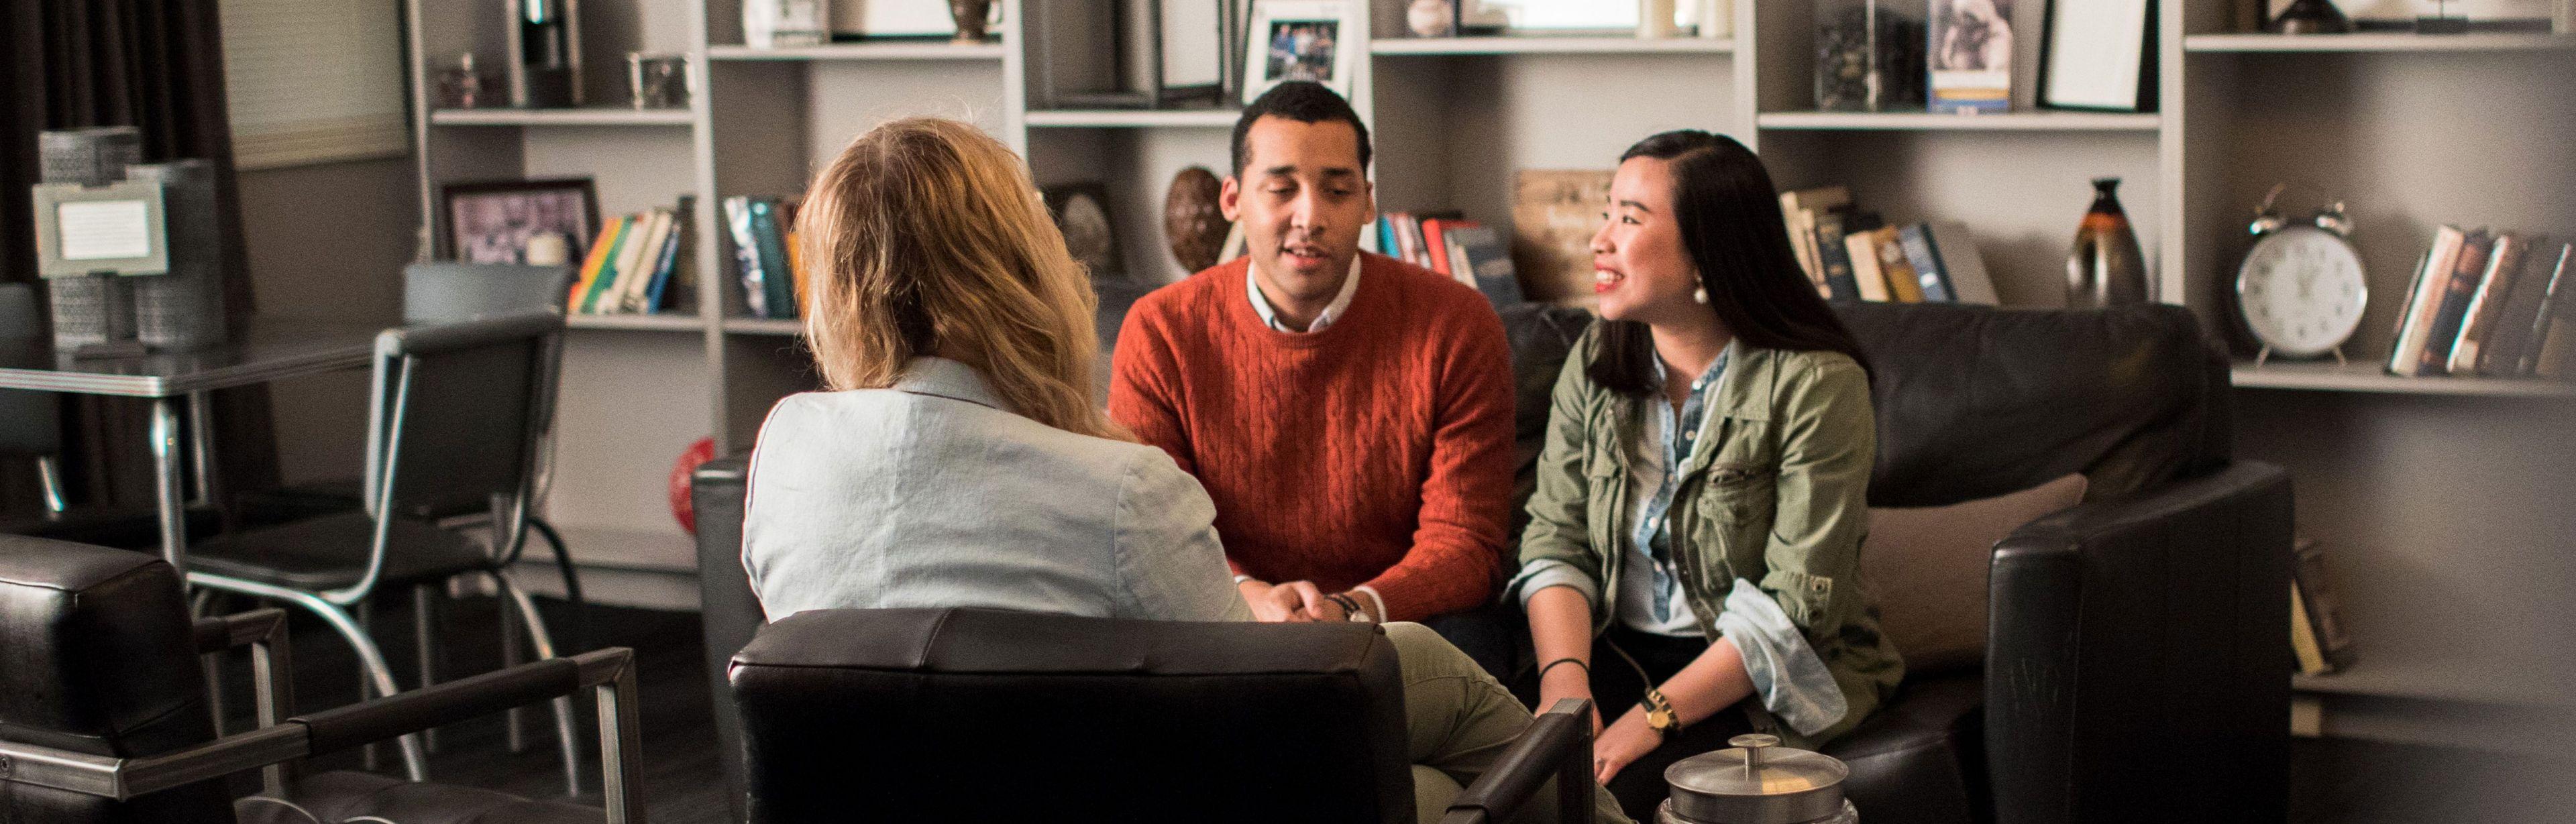 School Of Behavioral Sciences – Bachelor's Degrees